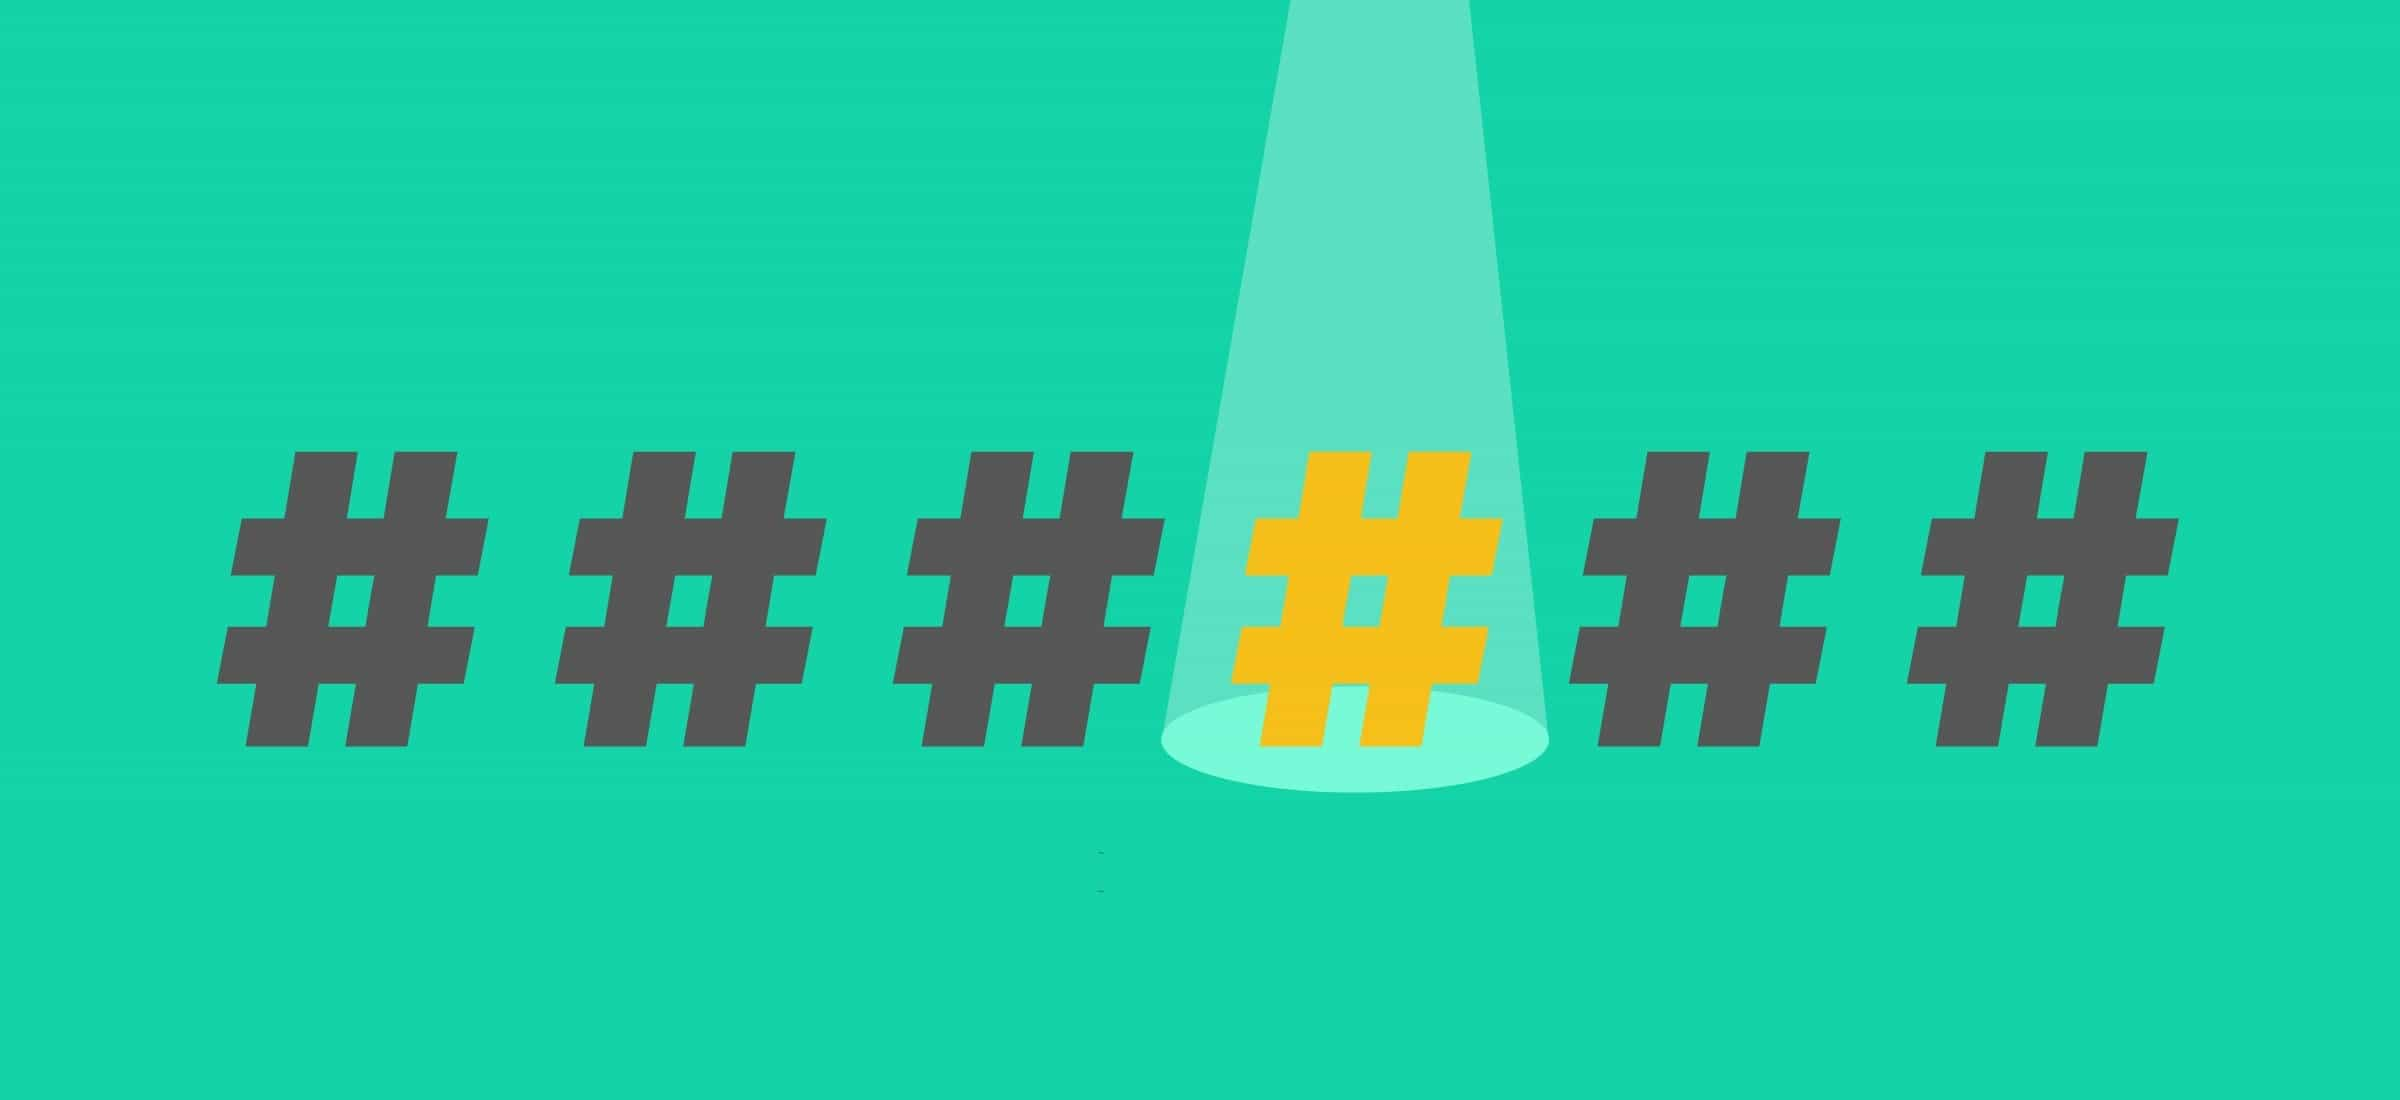 Hashtag perfecto pixel gd agencia